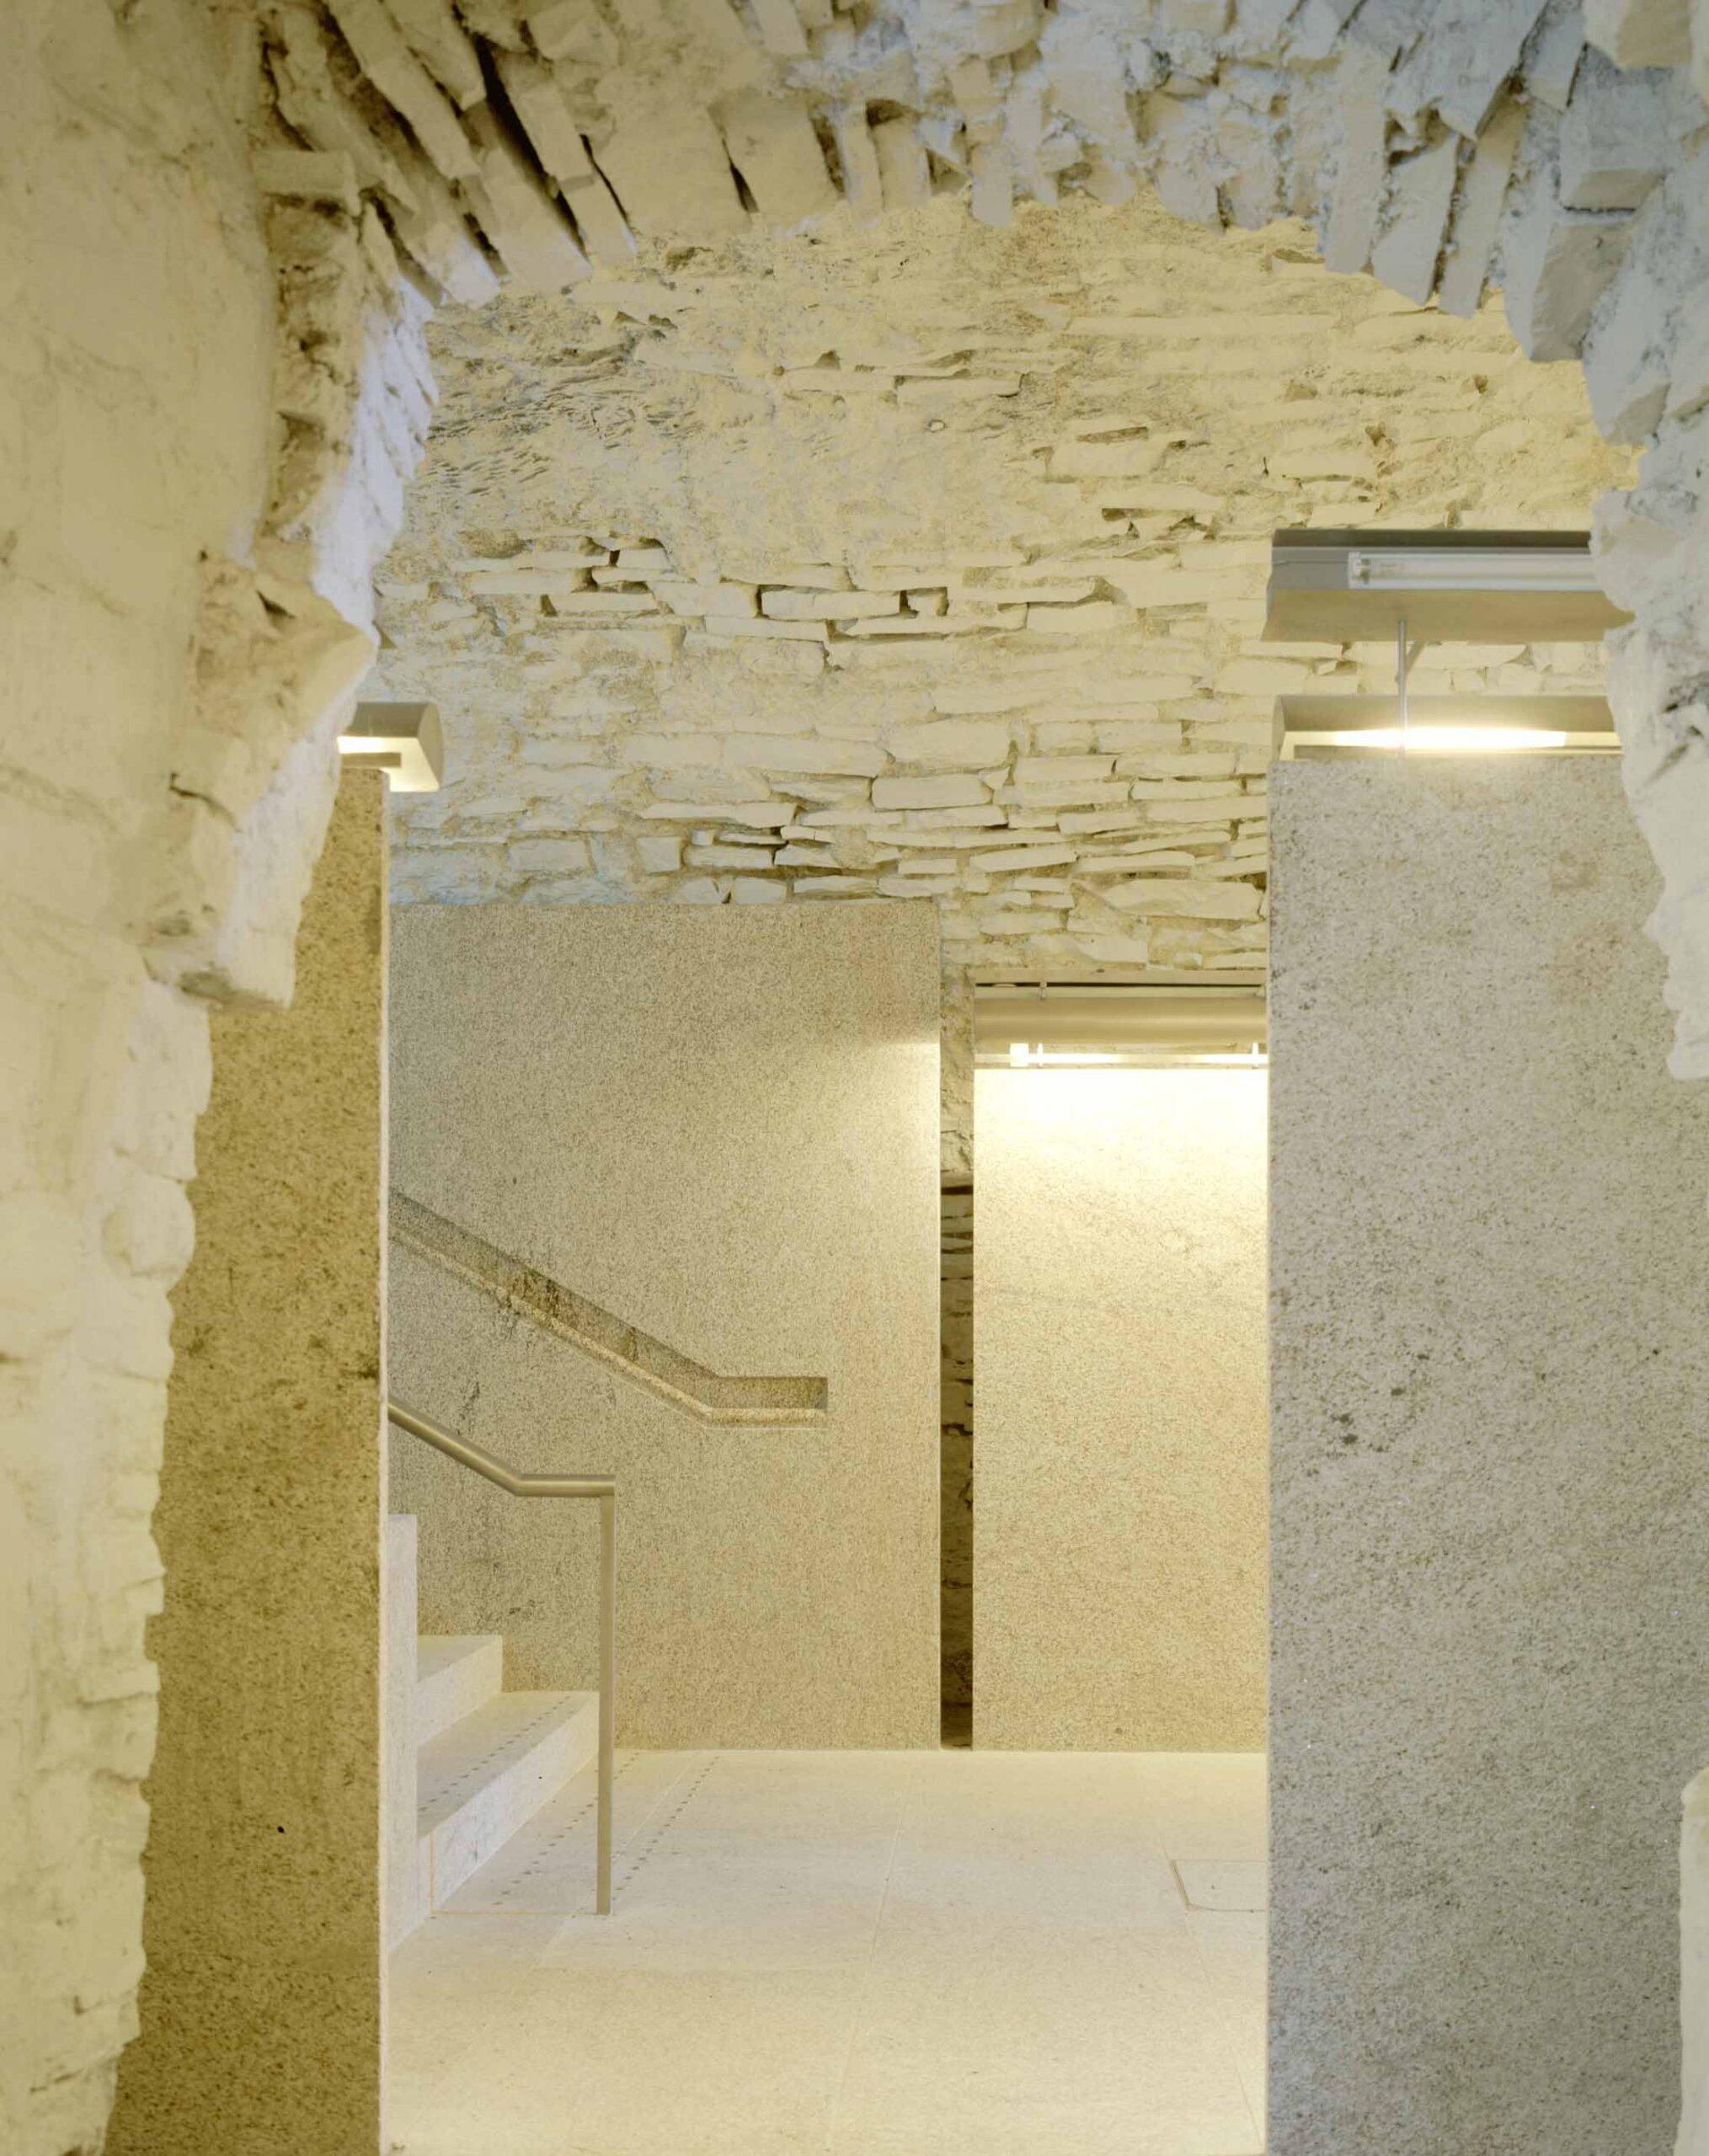 Maynooth Castle Interior